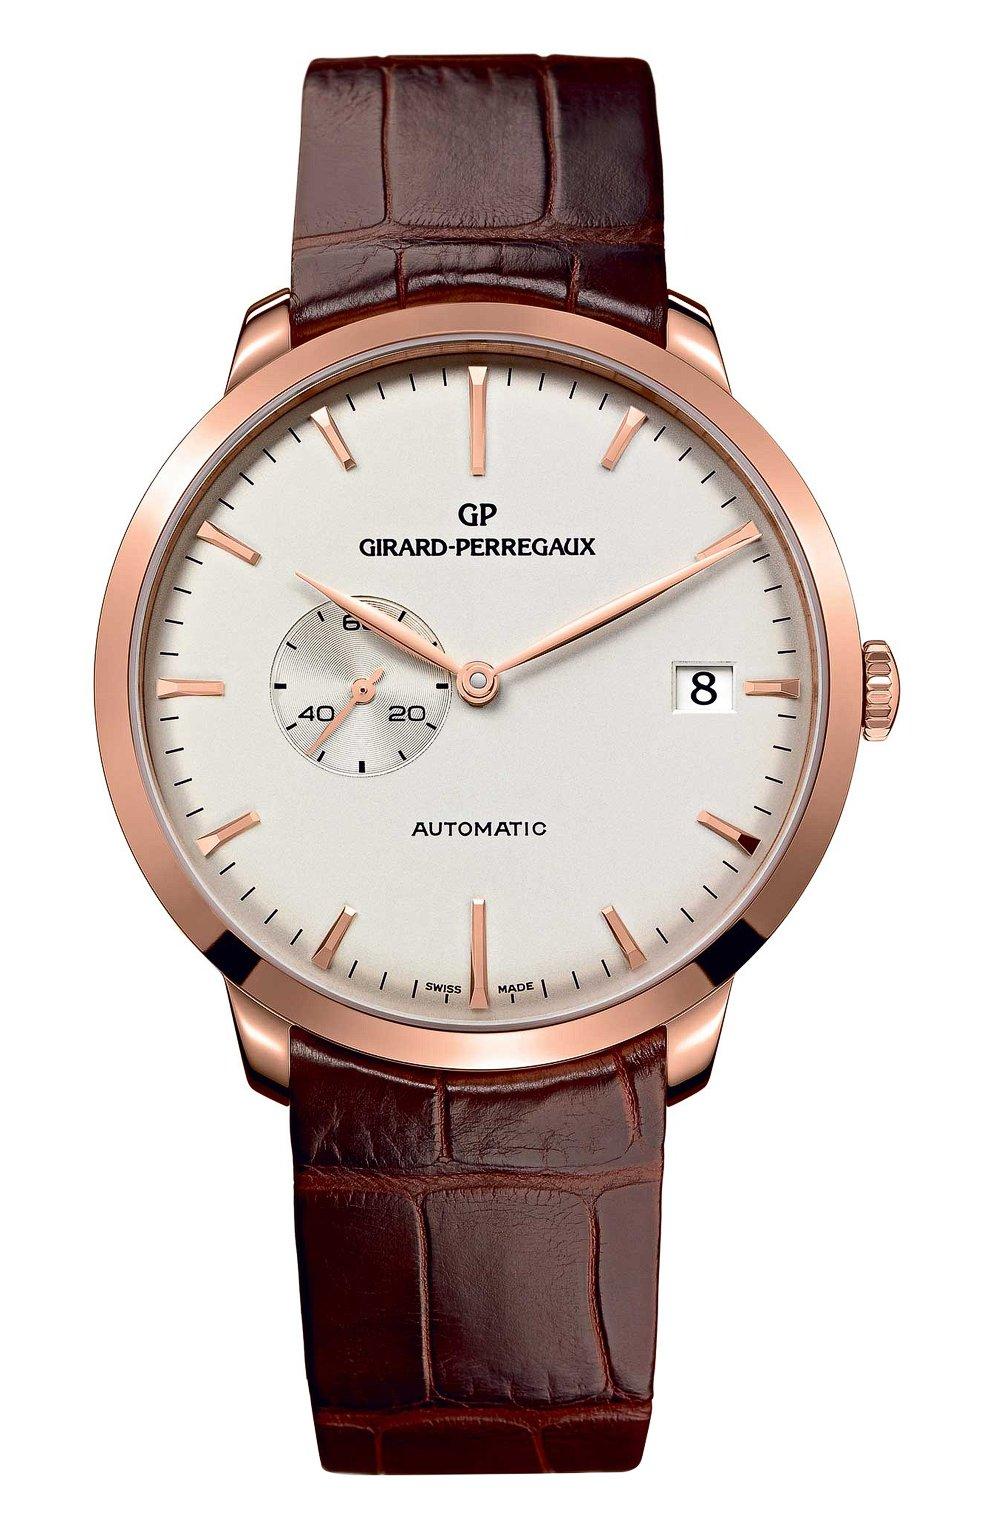 Мужские часы rose gold date white GIRARD-PERREGAUX бесцветного цвета, арт. 49543-52-131-BKBA   Фото 1 (Механизм: Автомат; Материал корпуса: Розовое золото; Цвет циферблата: Белый)